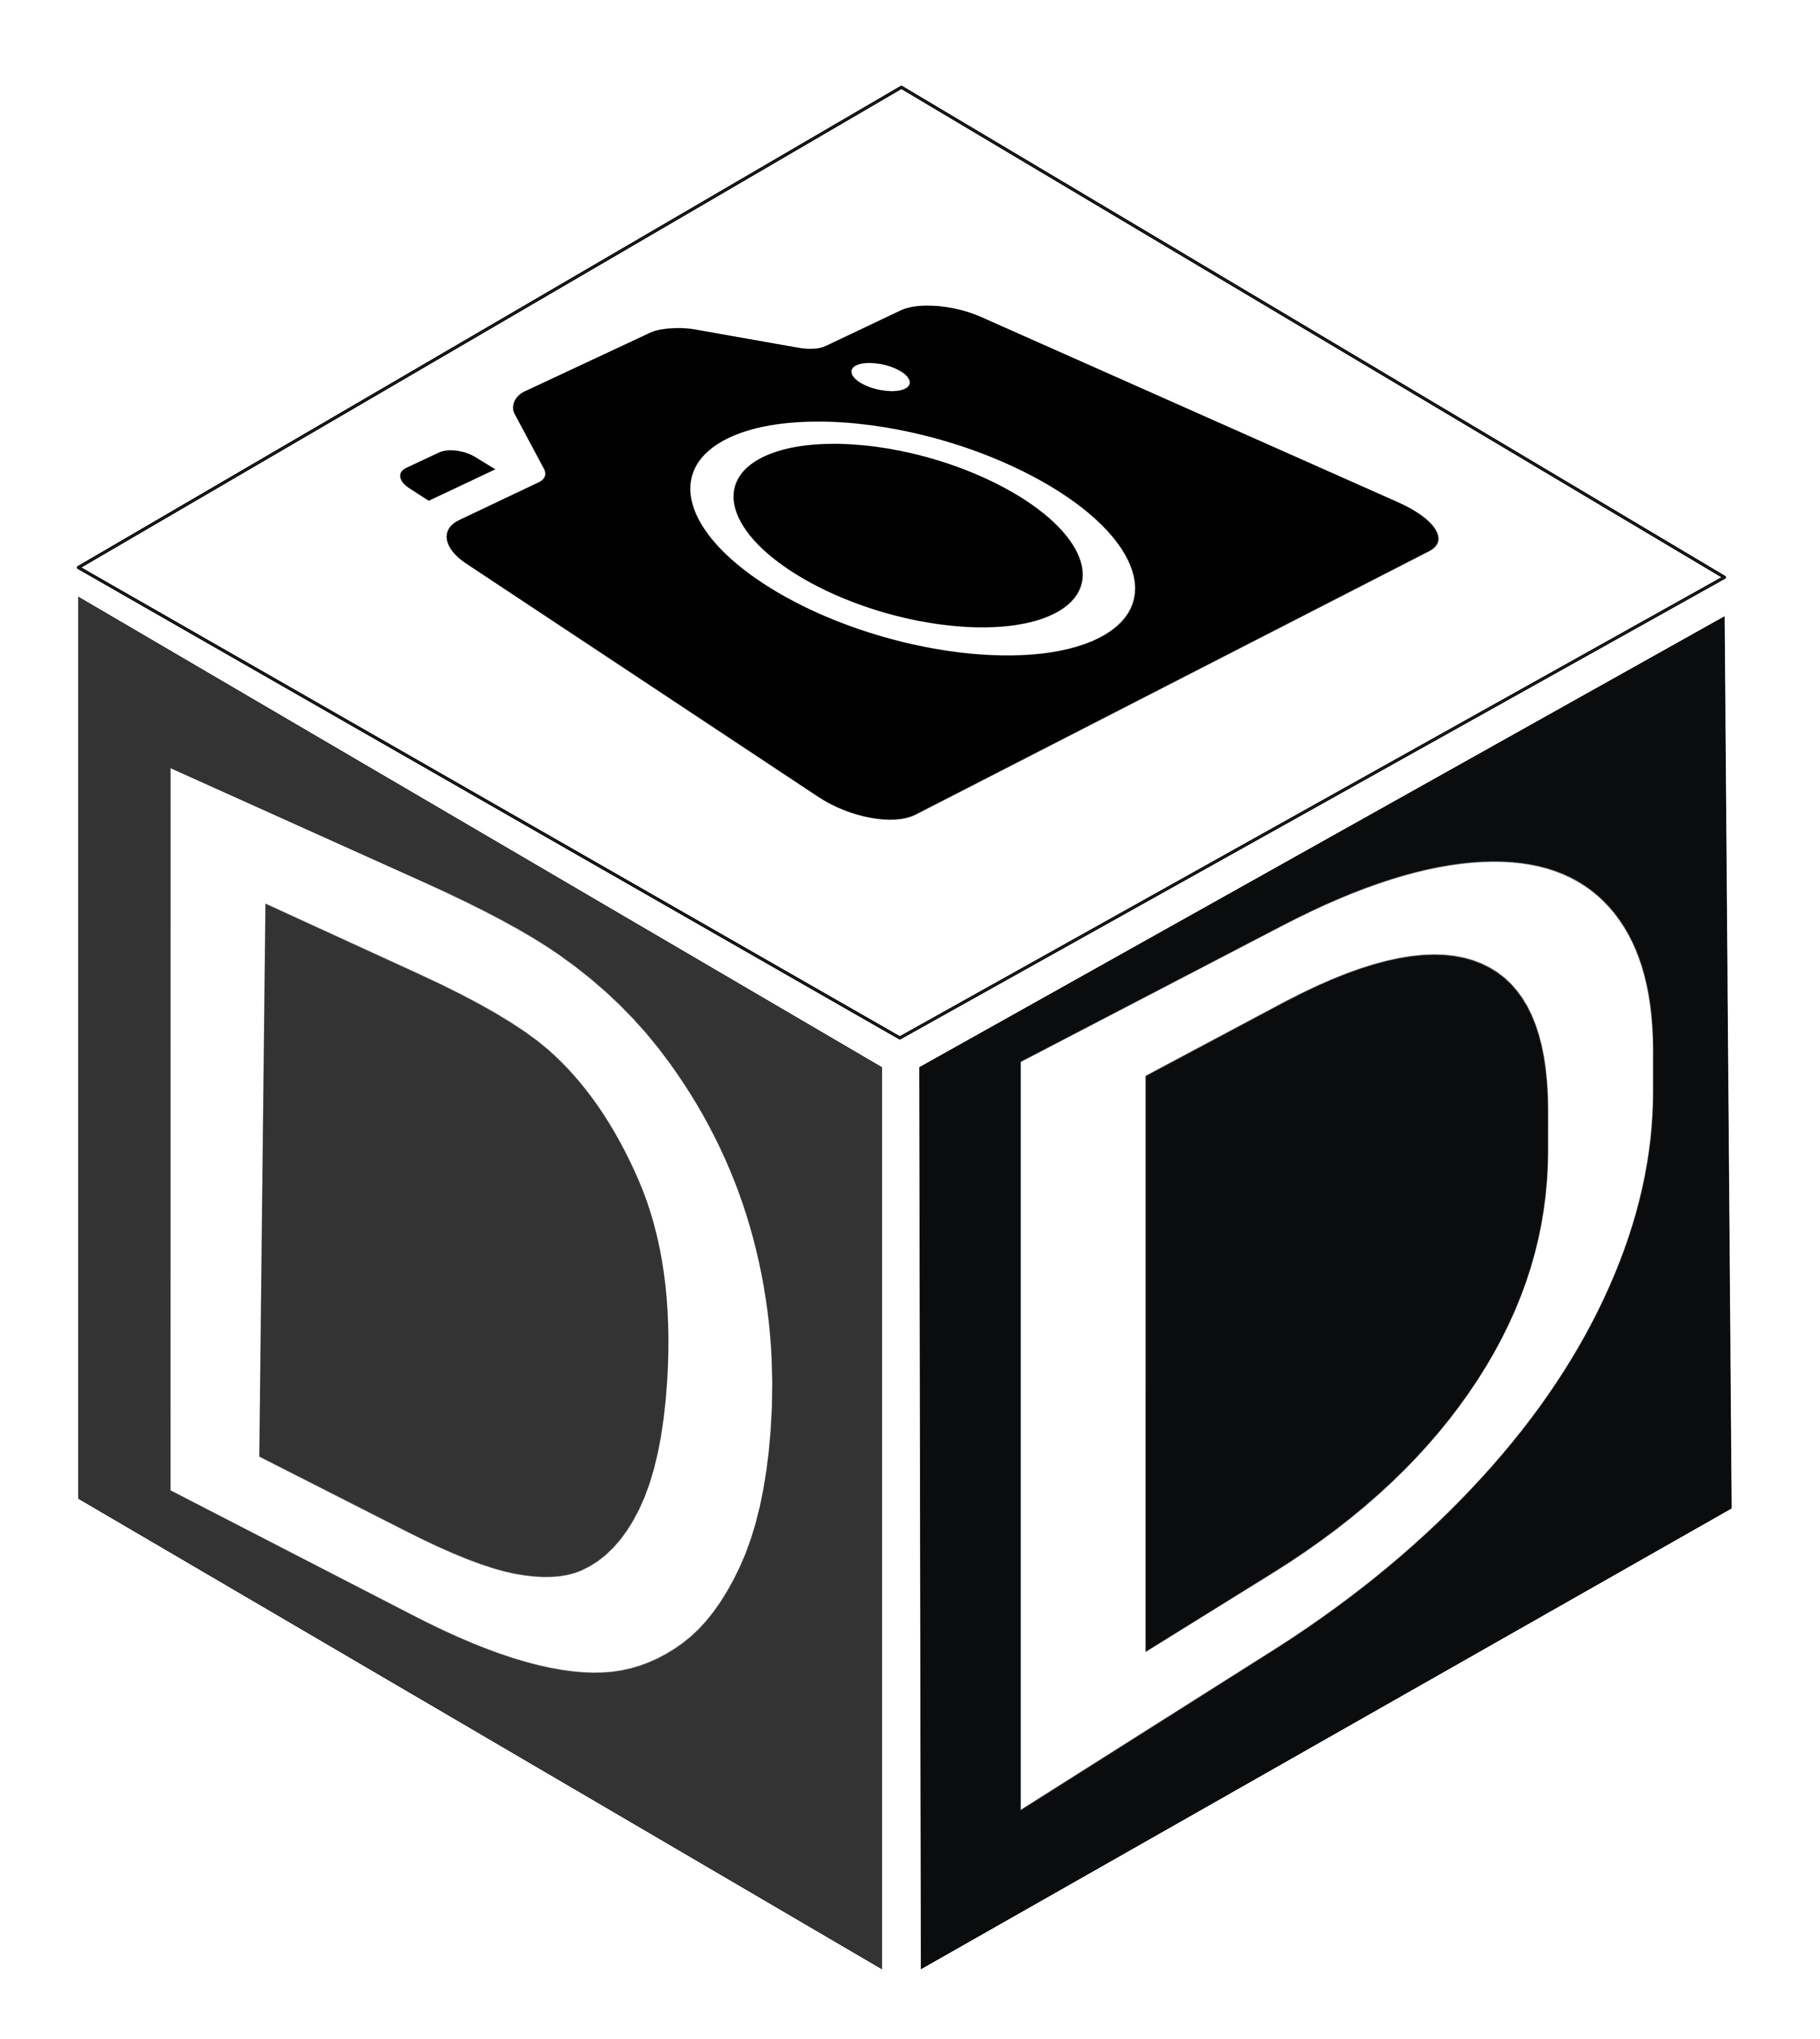 Dave Diabolisch